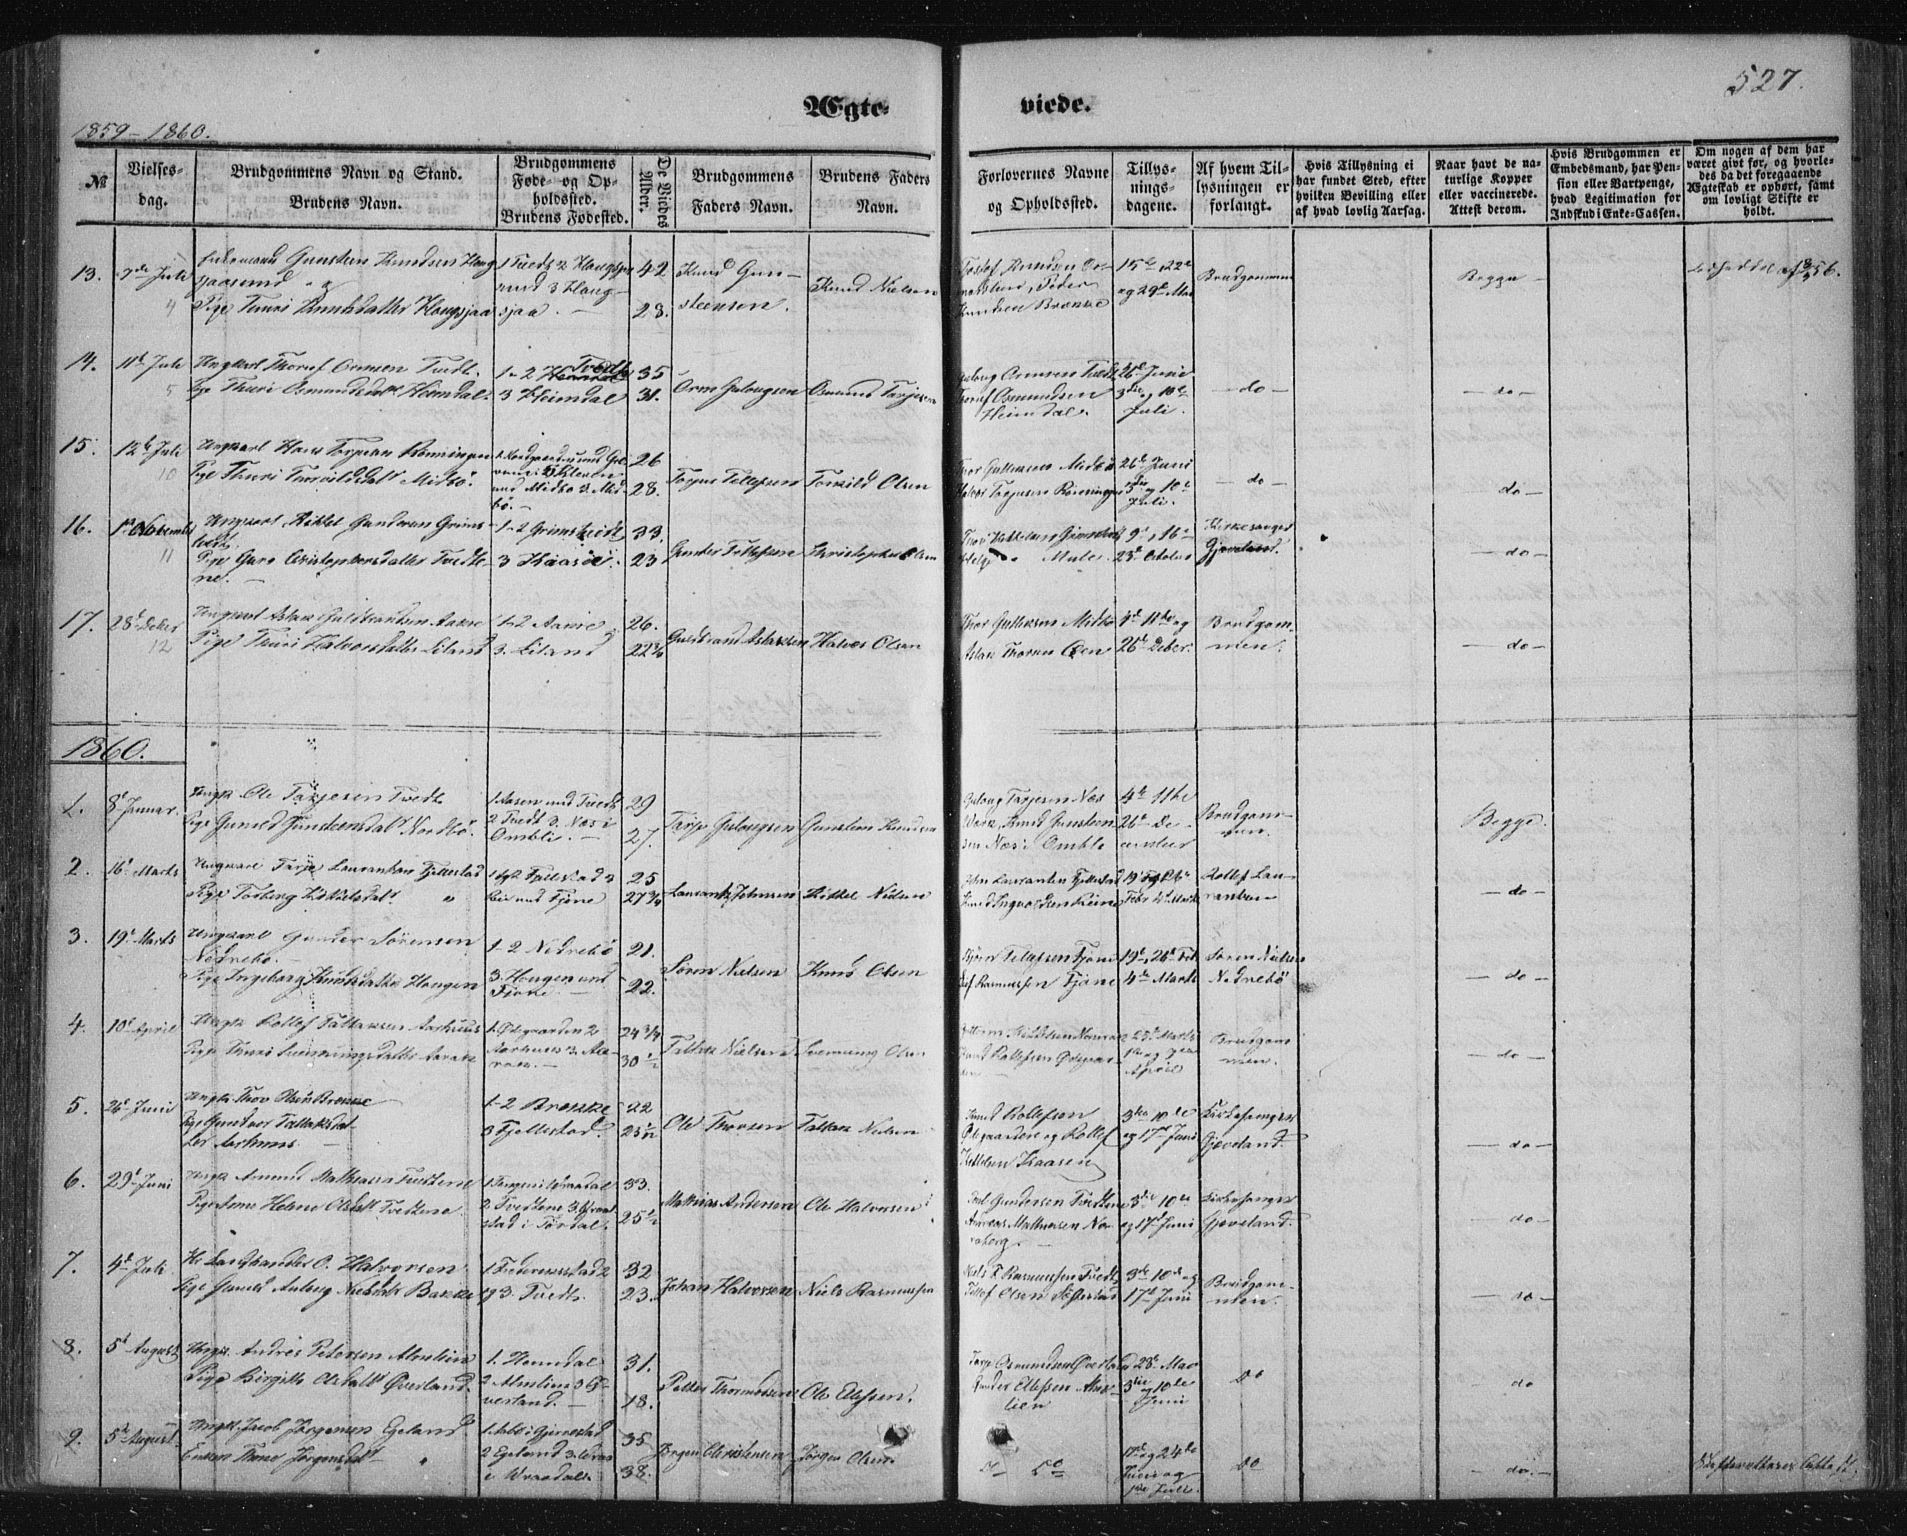 SAKO, Nissedal kirkebøker, F/Fa/L0003: Ministerialbok nr. I 3, 1846-1870, s. 526-527